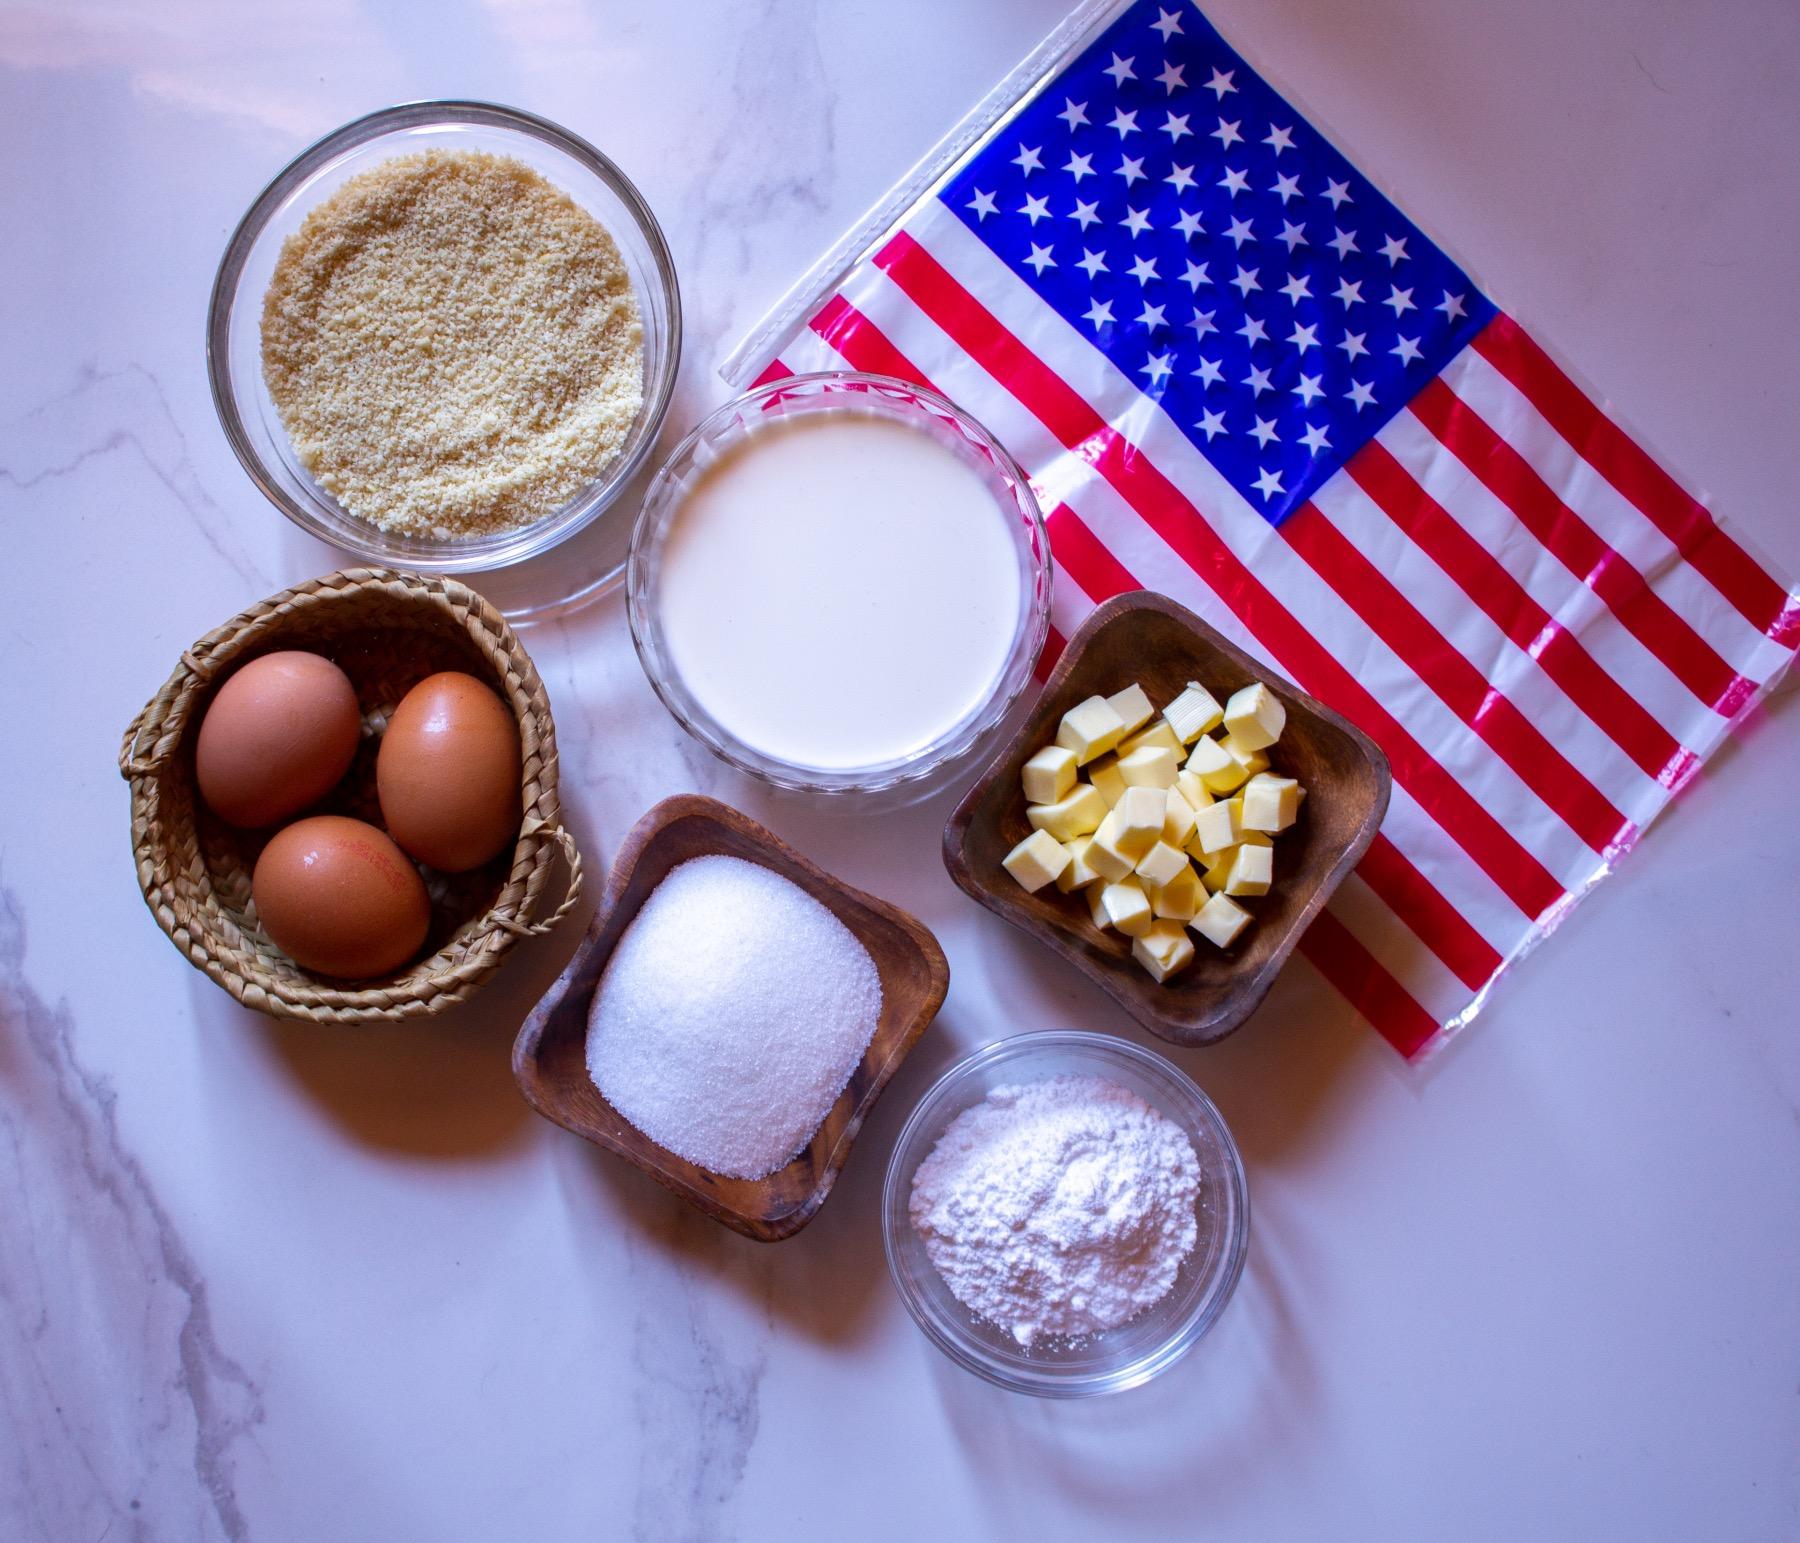 ingredients to make 4th of july macarons